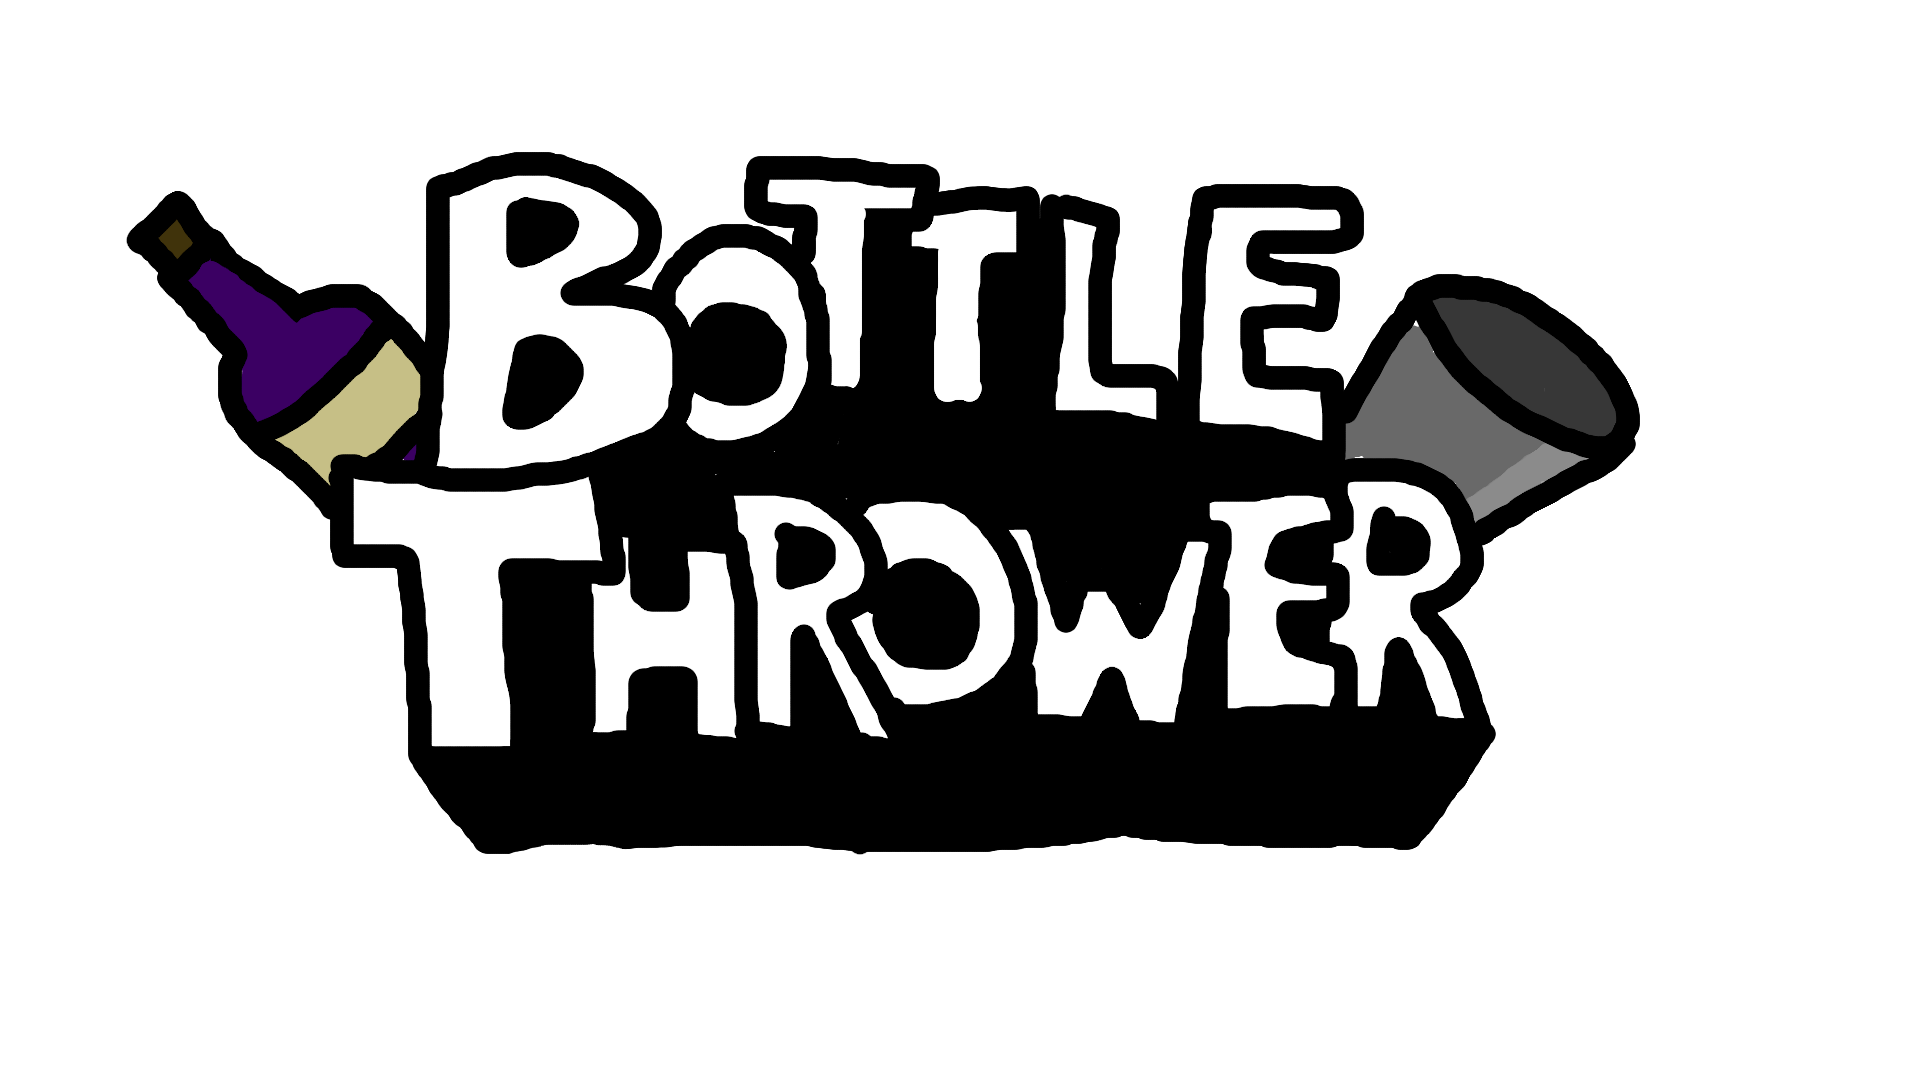 Bottle Thrower